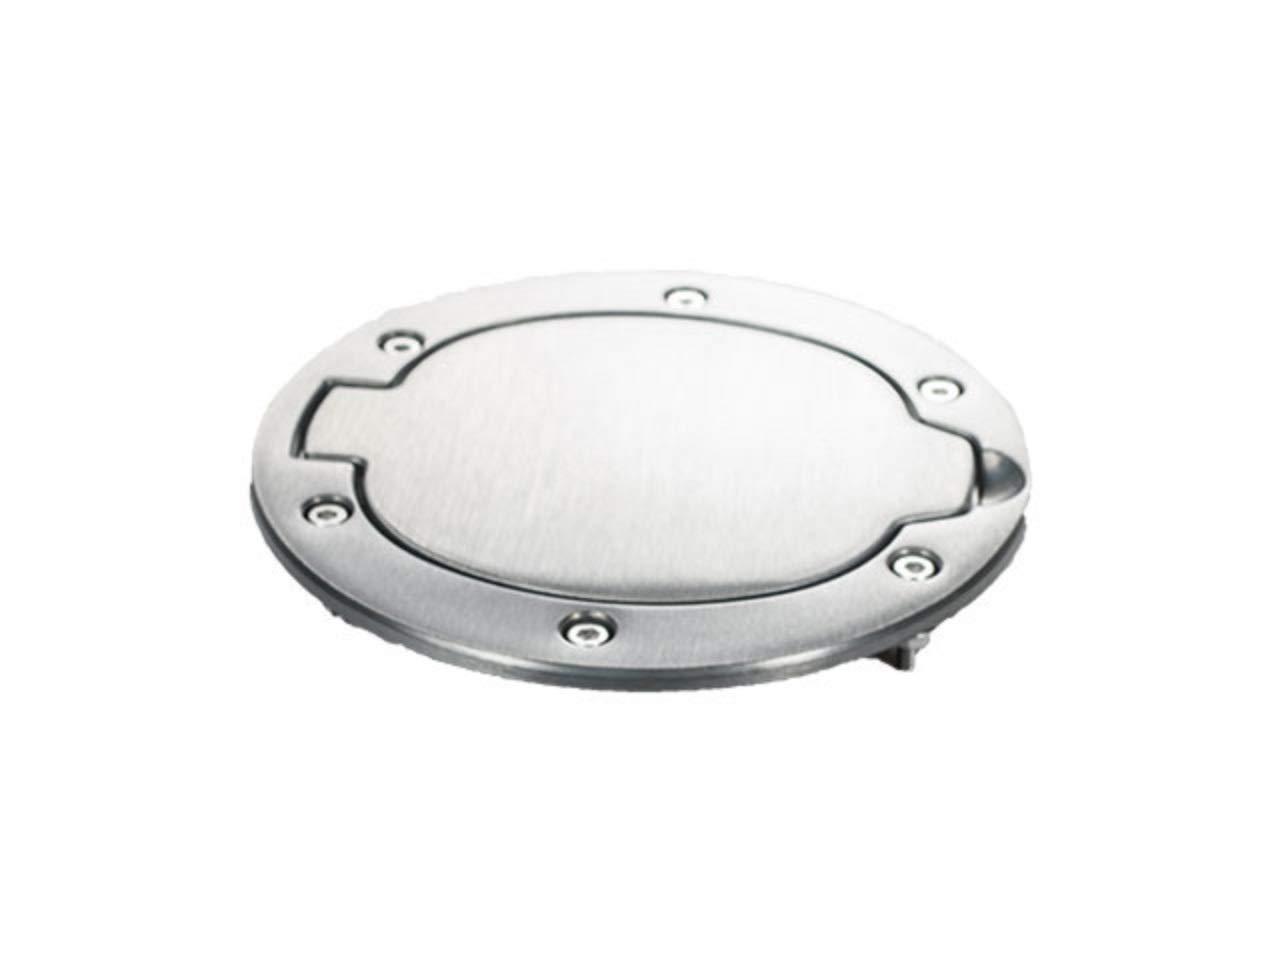 1 Pack Mopar 82207715 Brushed Aluminum Fuel Filler Door